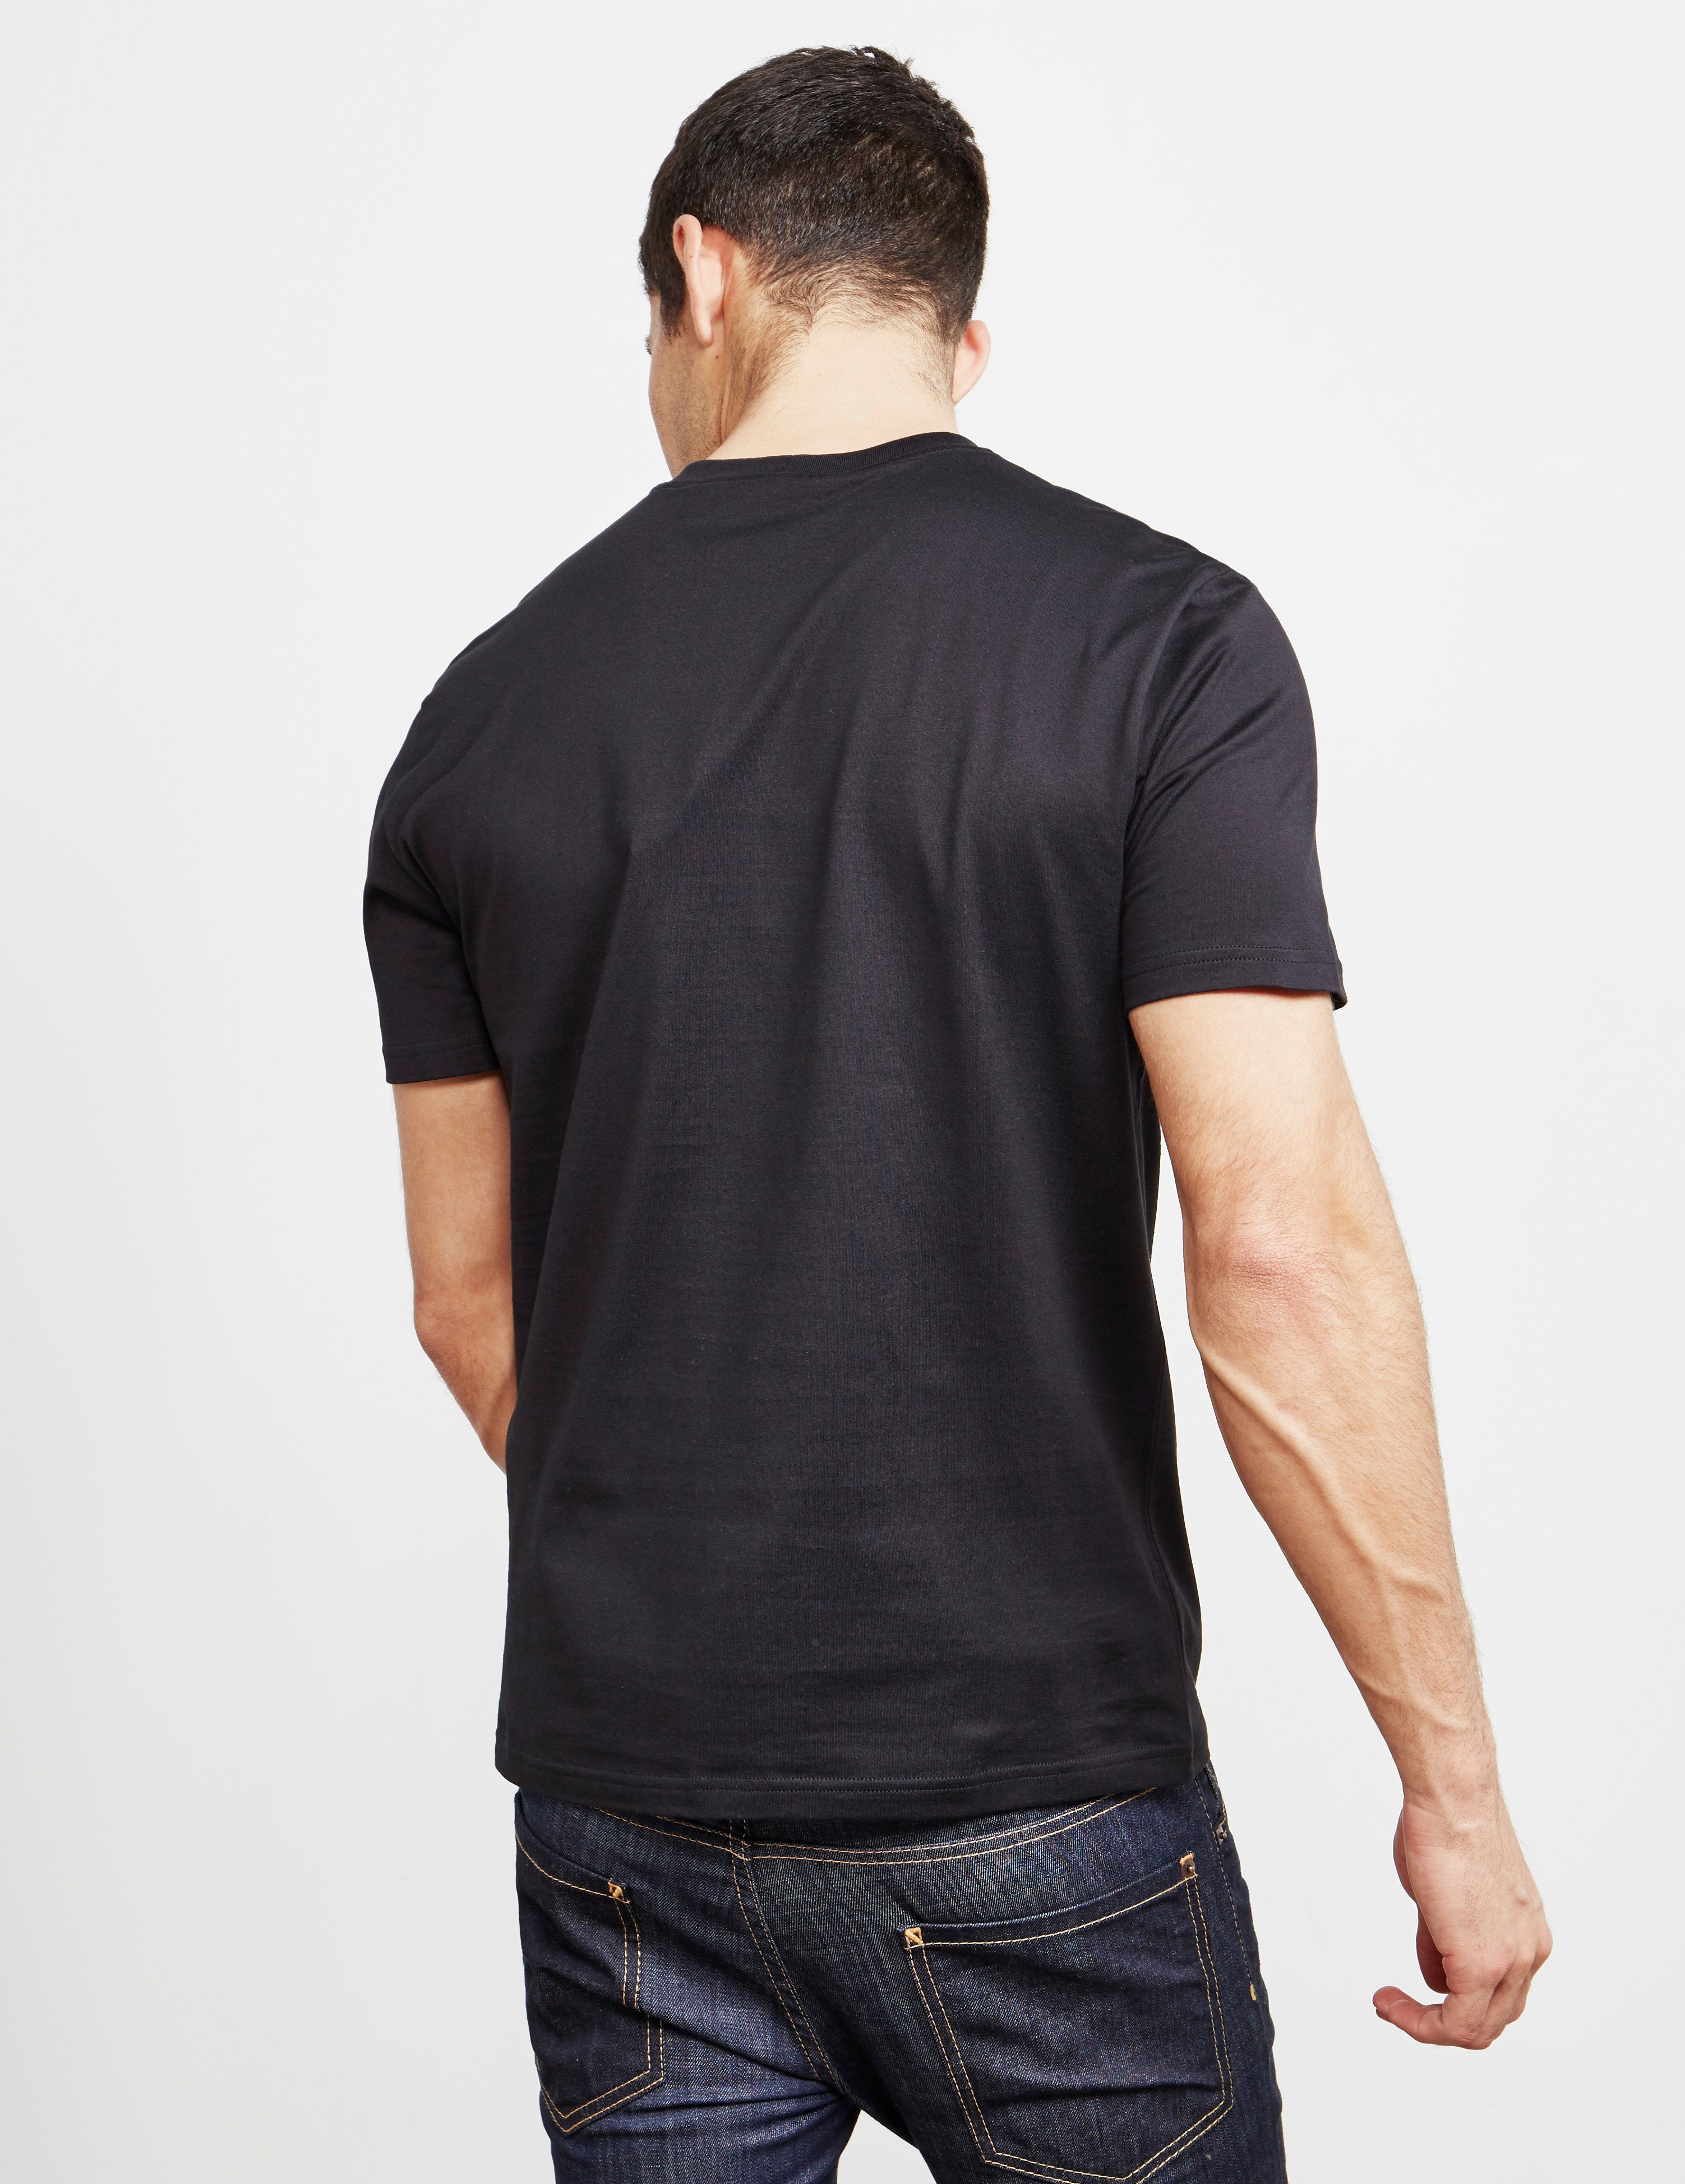 Versus Versace Reflective Logo Short Sleeve T-Shirt